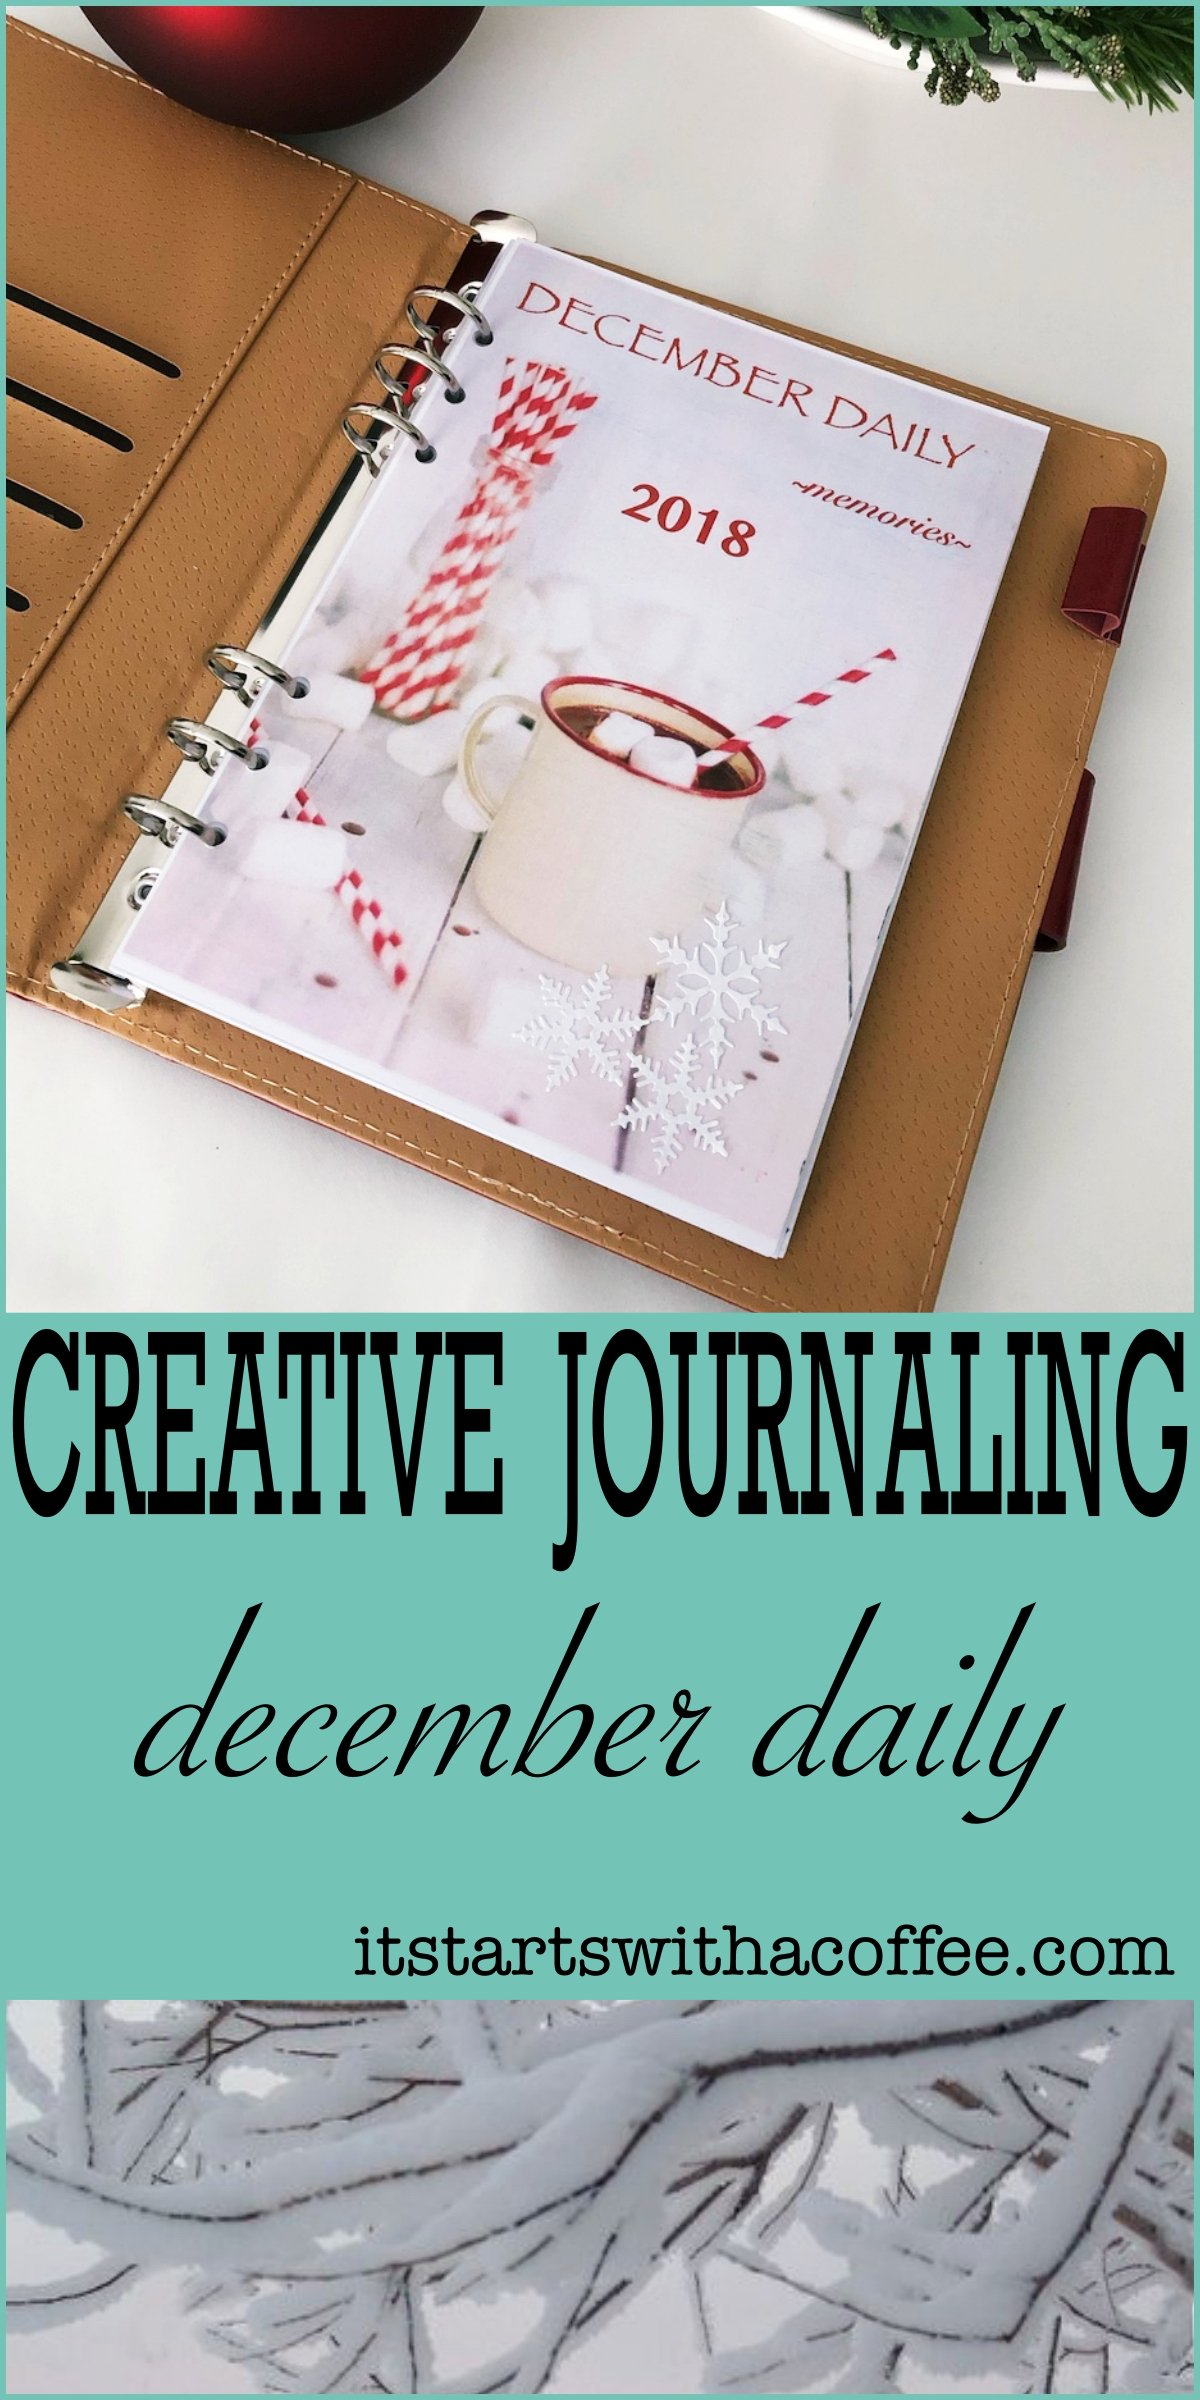 Creative journaling - December daily memories - itstartswithacoffee.com #creativejournaling #journaling #daily #december #planner #memories